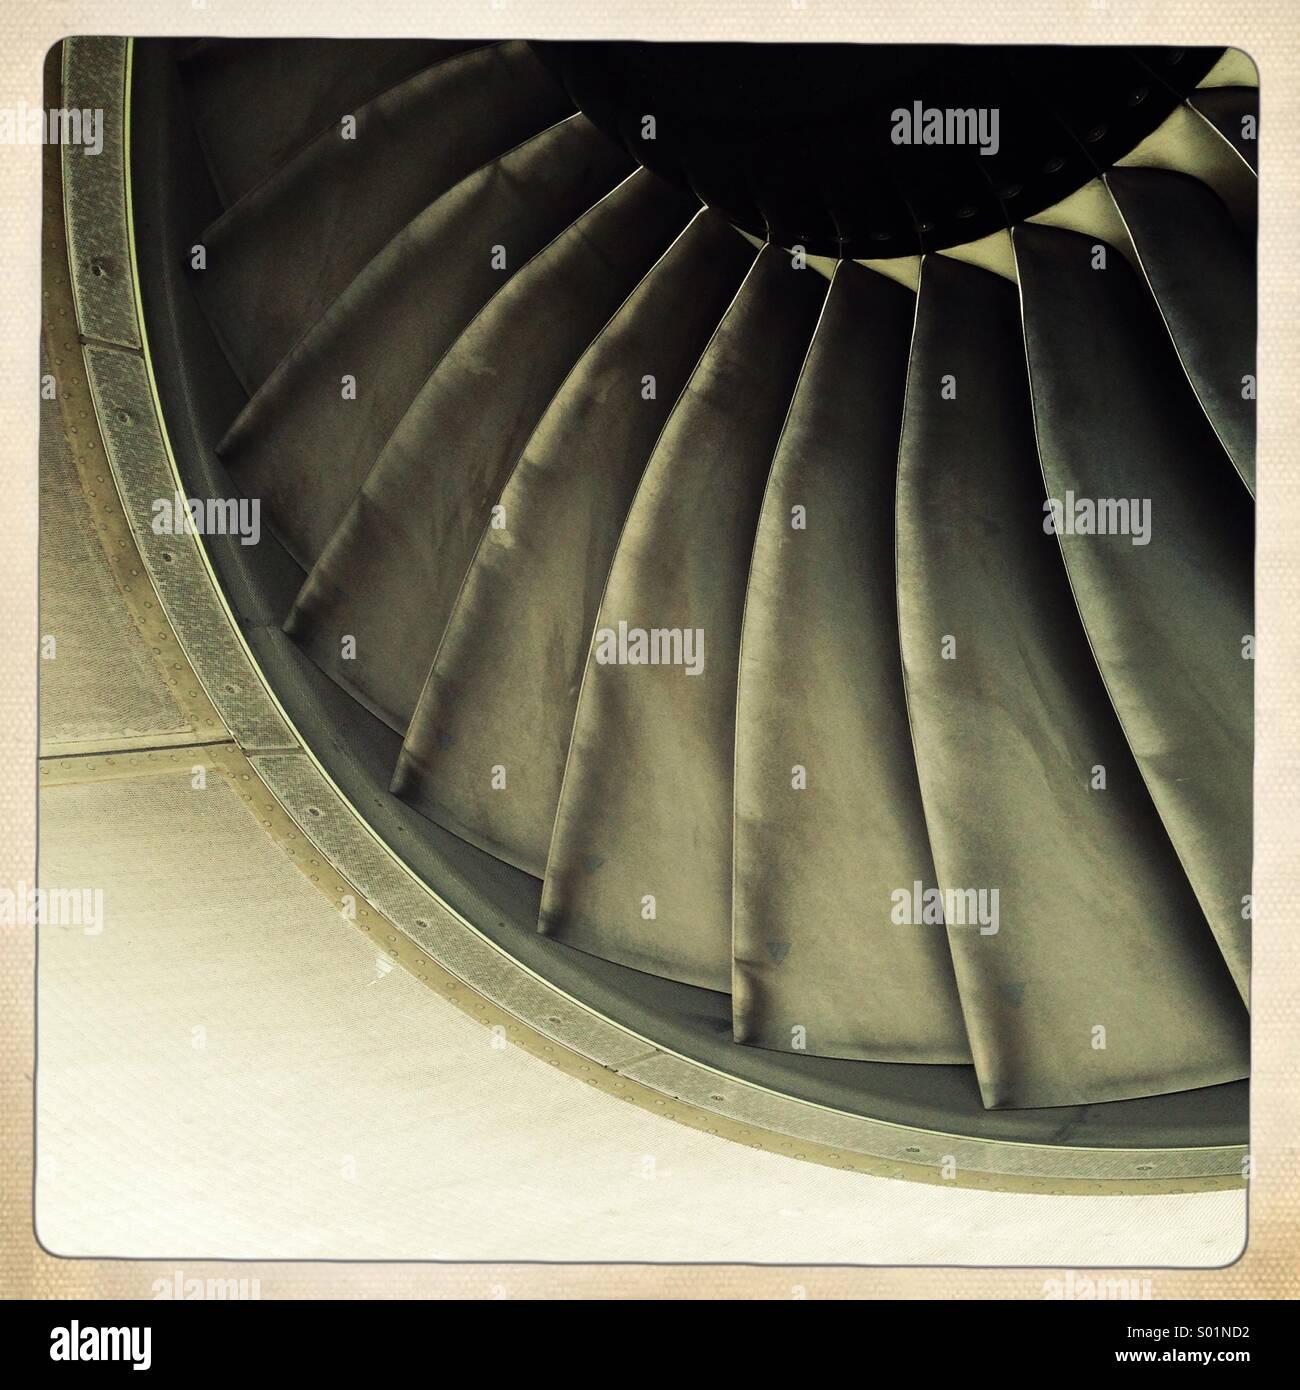 Motore aeronautico lame Immagini Stock